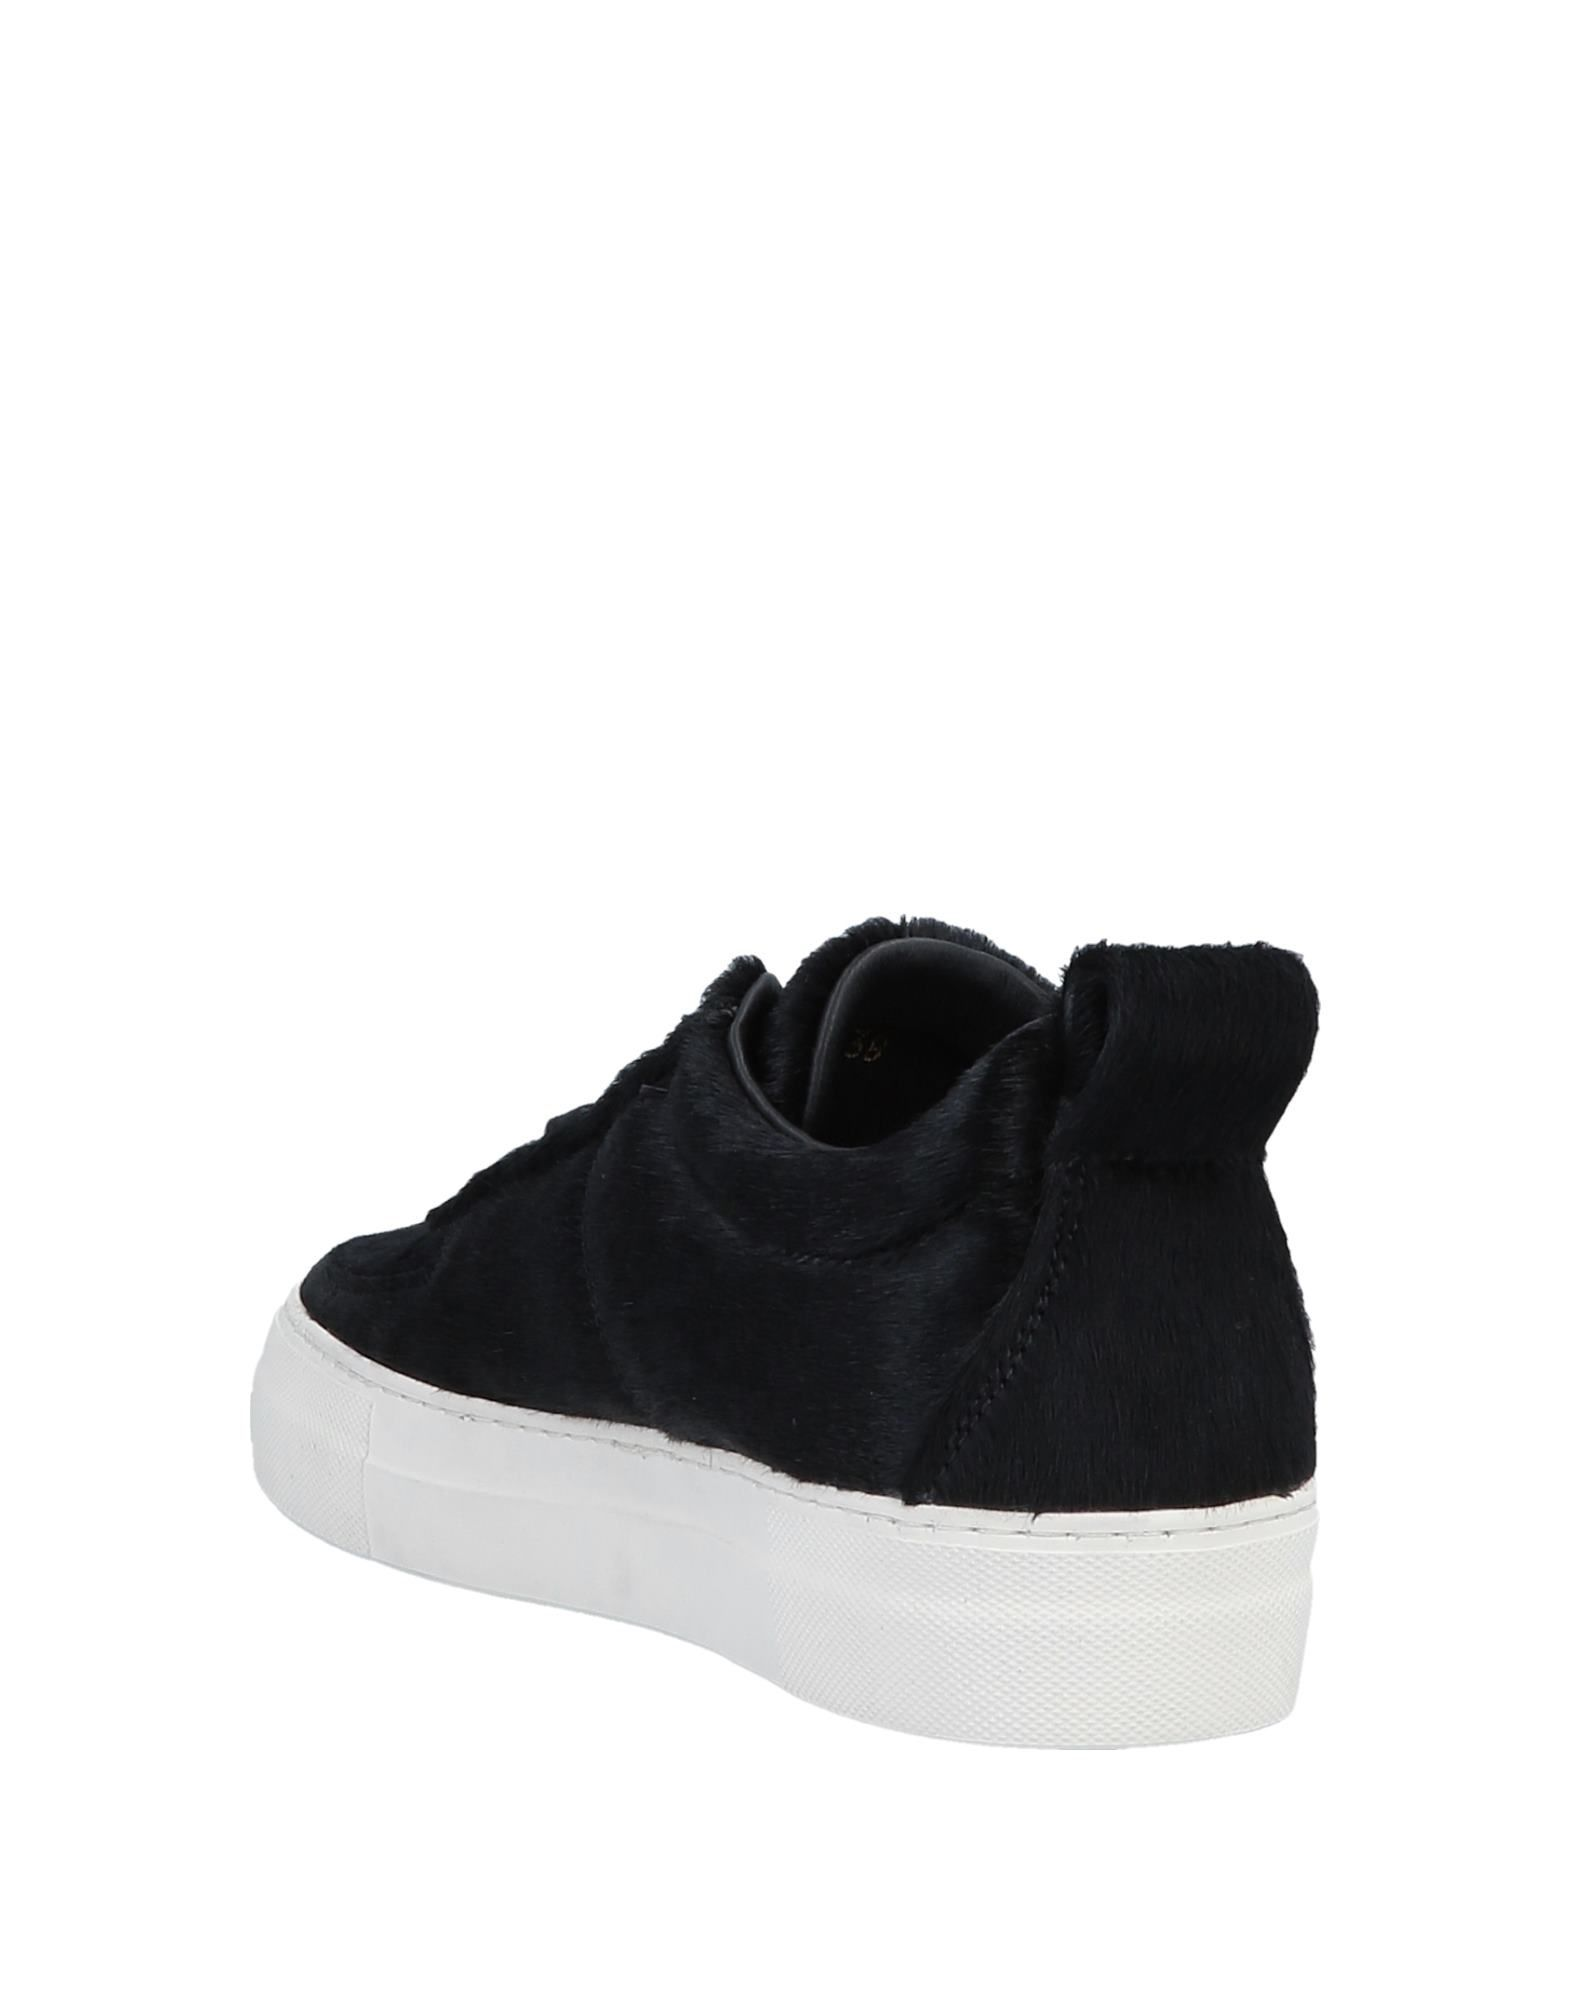 Helmut Lang Black Calf Leather Sneakers